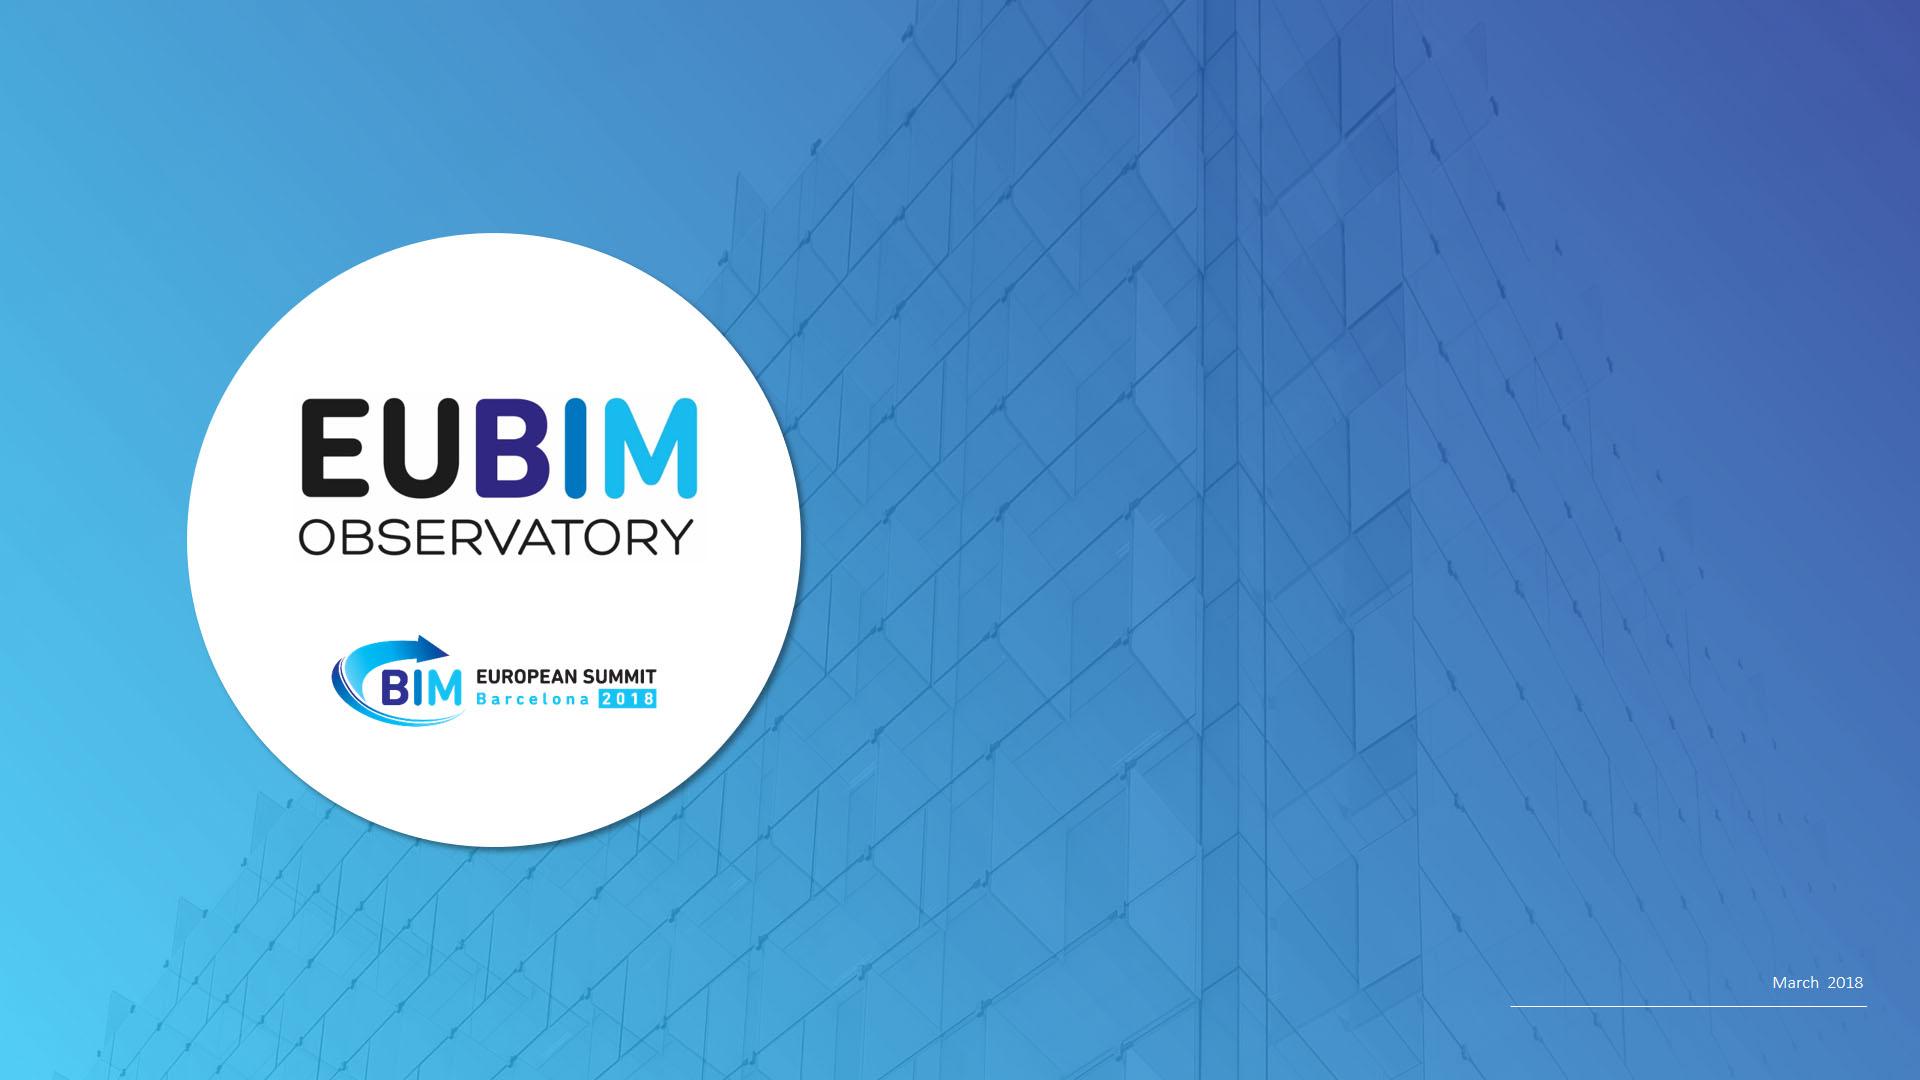 EUBIM Observatory